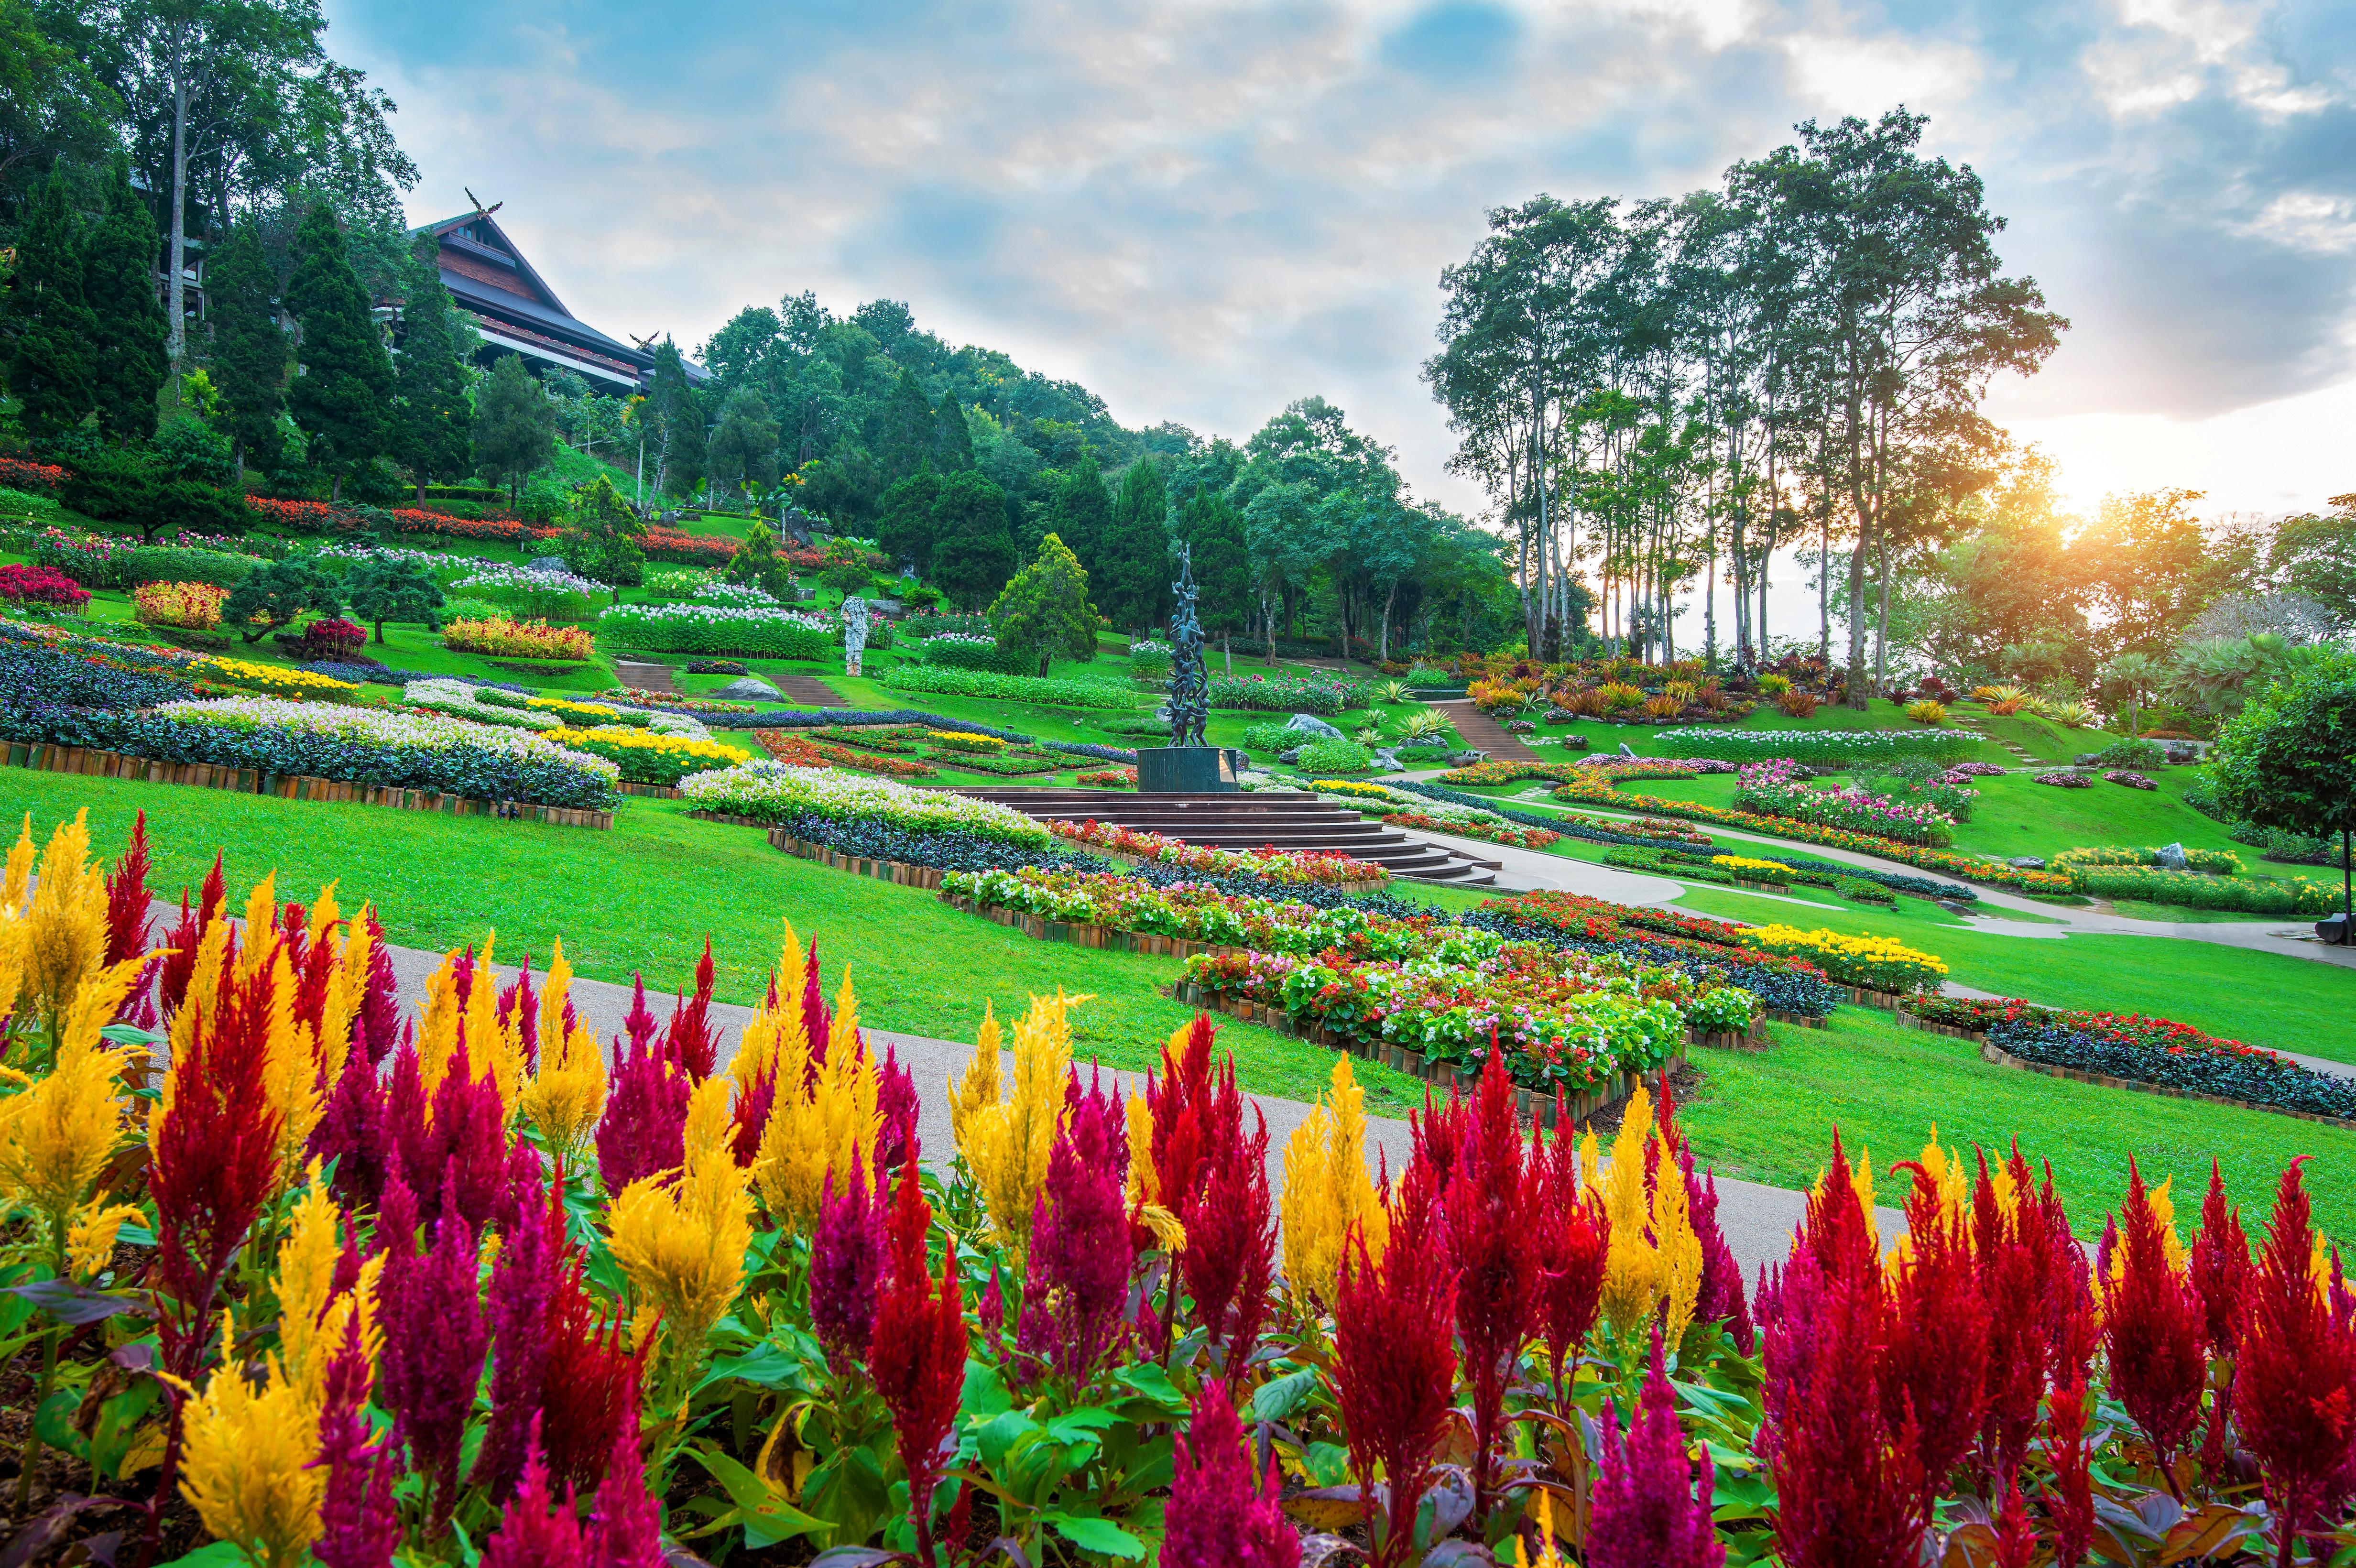 garden-flowers-mae-fah-luang-garden-locate-doi-tung-chiang-rai-thailand.jpg